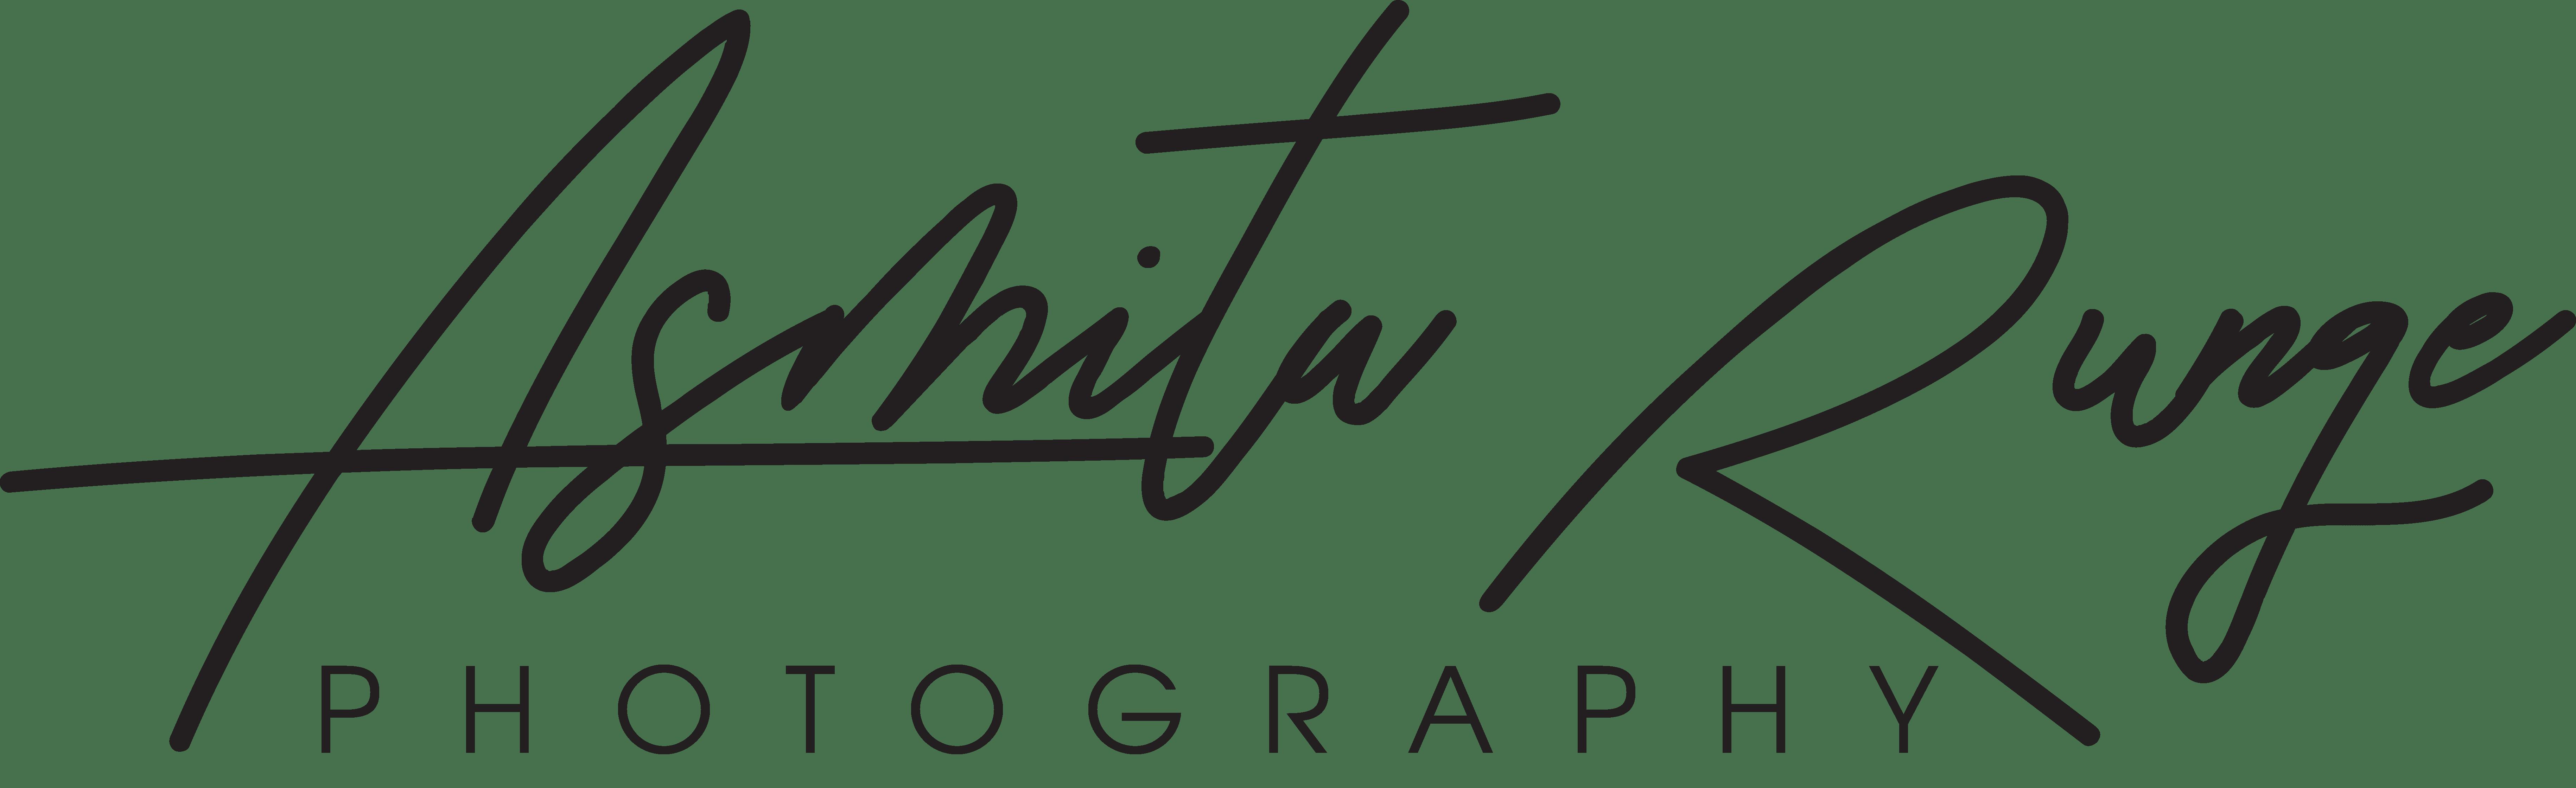 asmitarungephotography